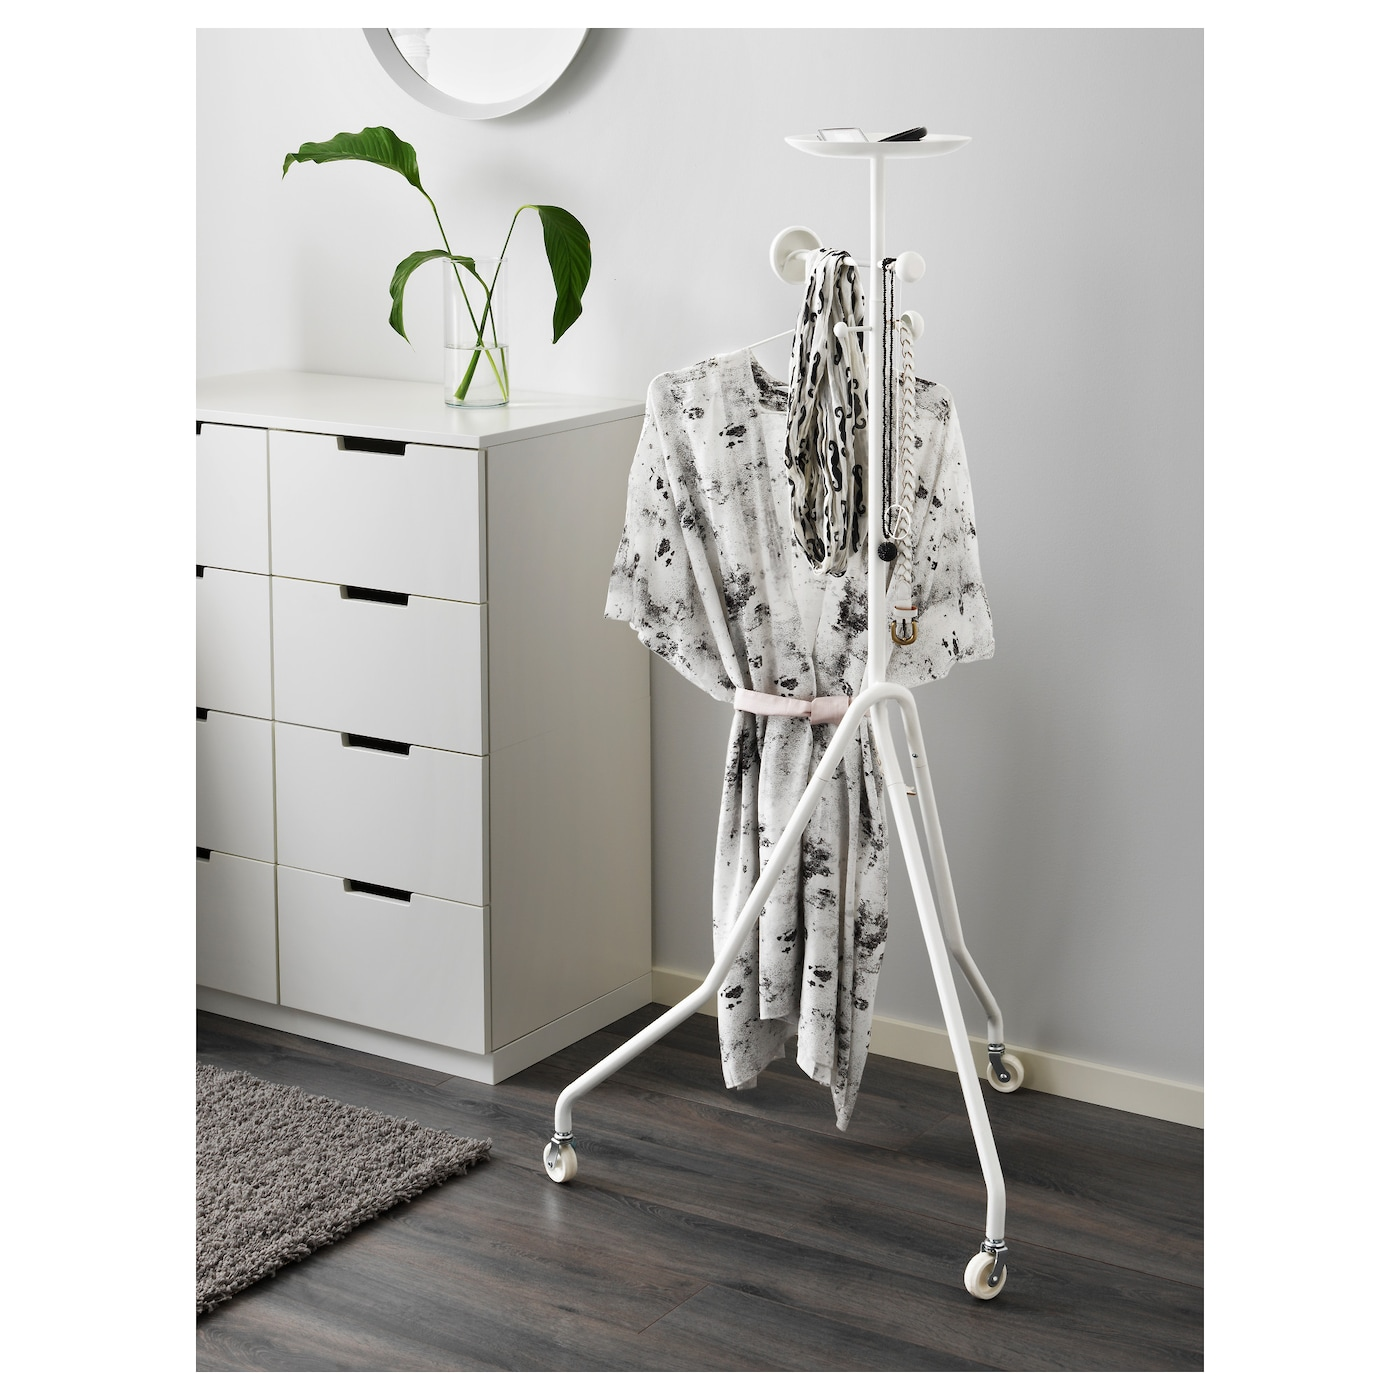 ikea ps 2017 valet stand white ikea. Black Bedroom Furniture Sets. Home Design Ideas